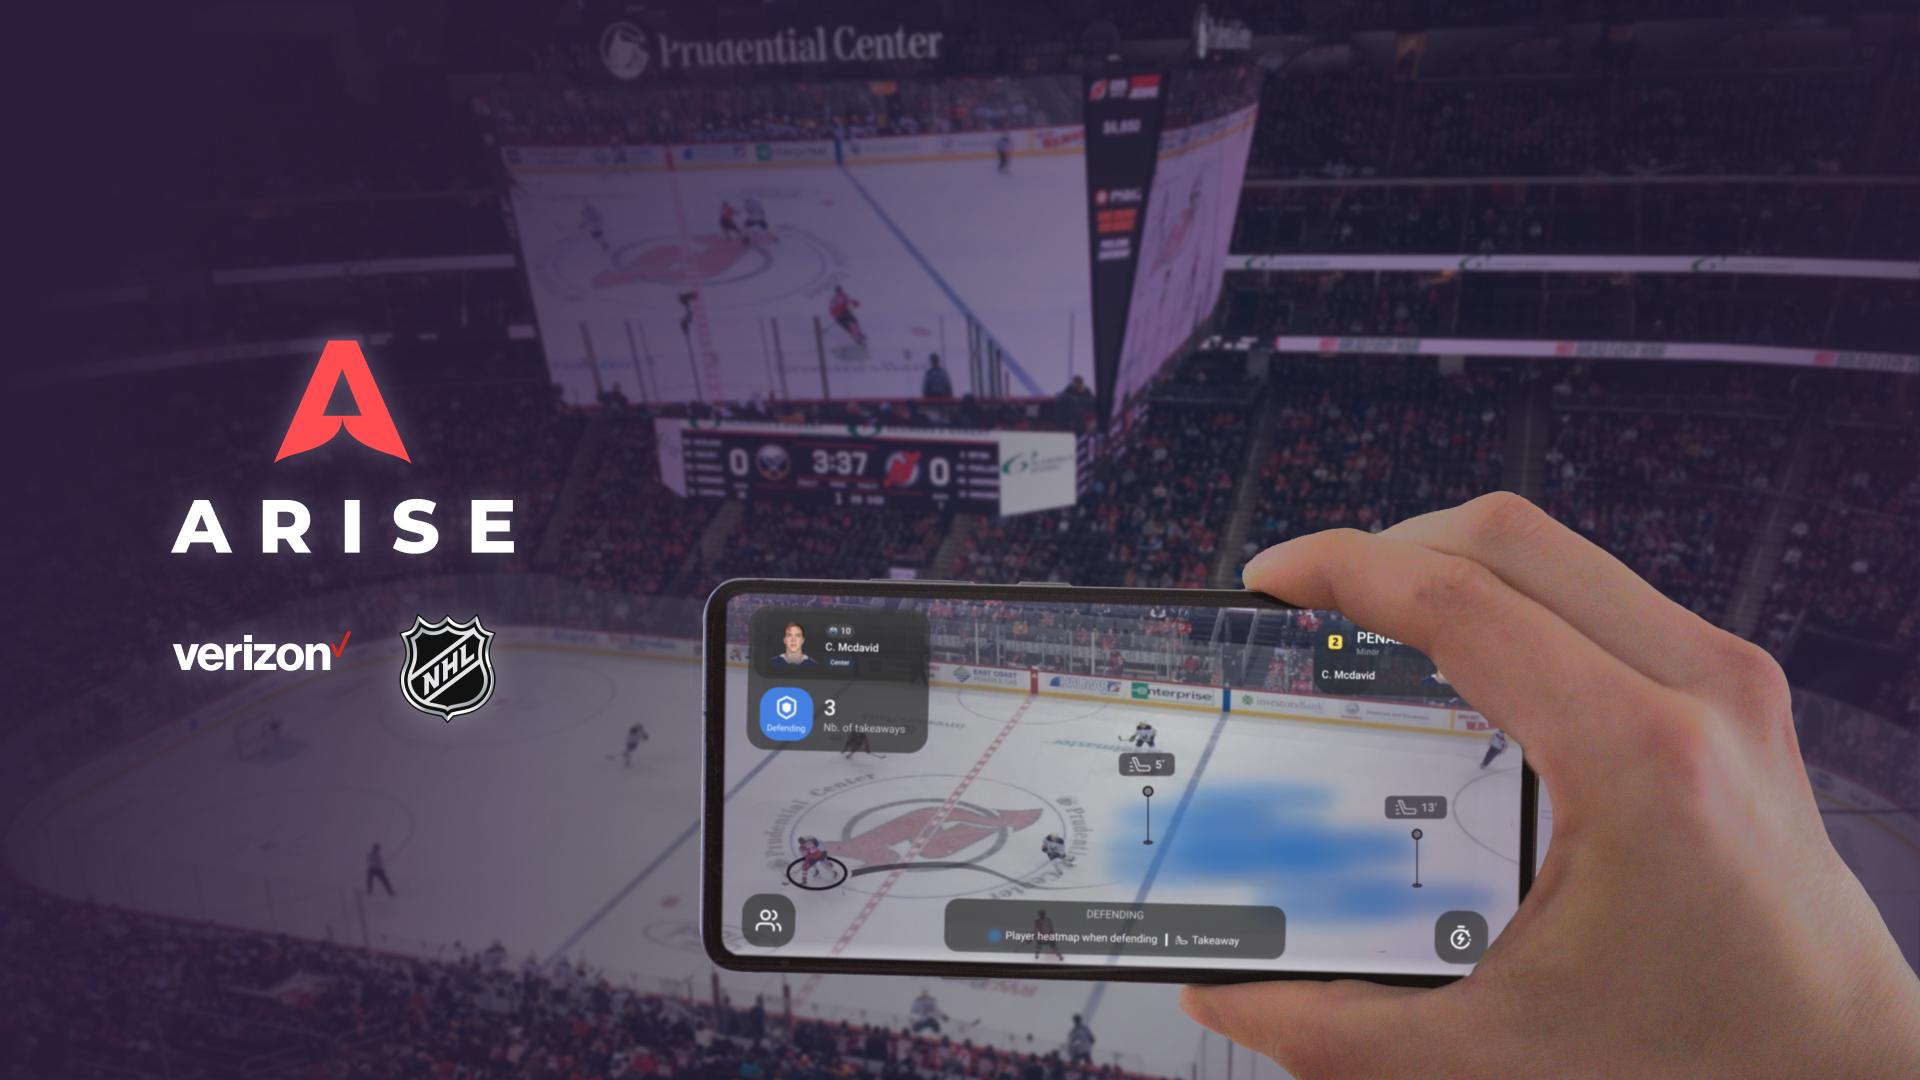 NHL Verizon Augmented Reality App 5G